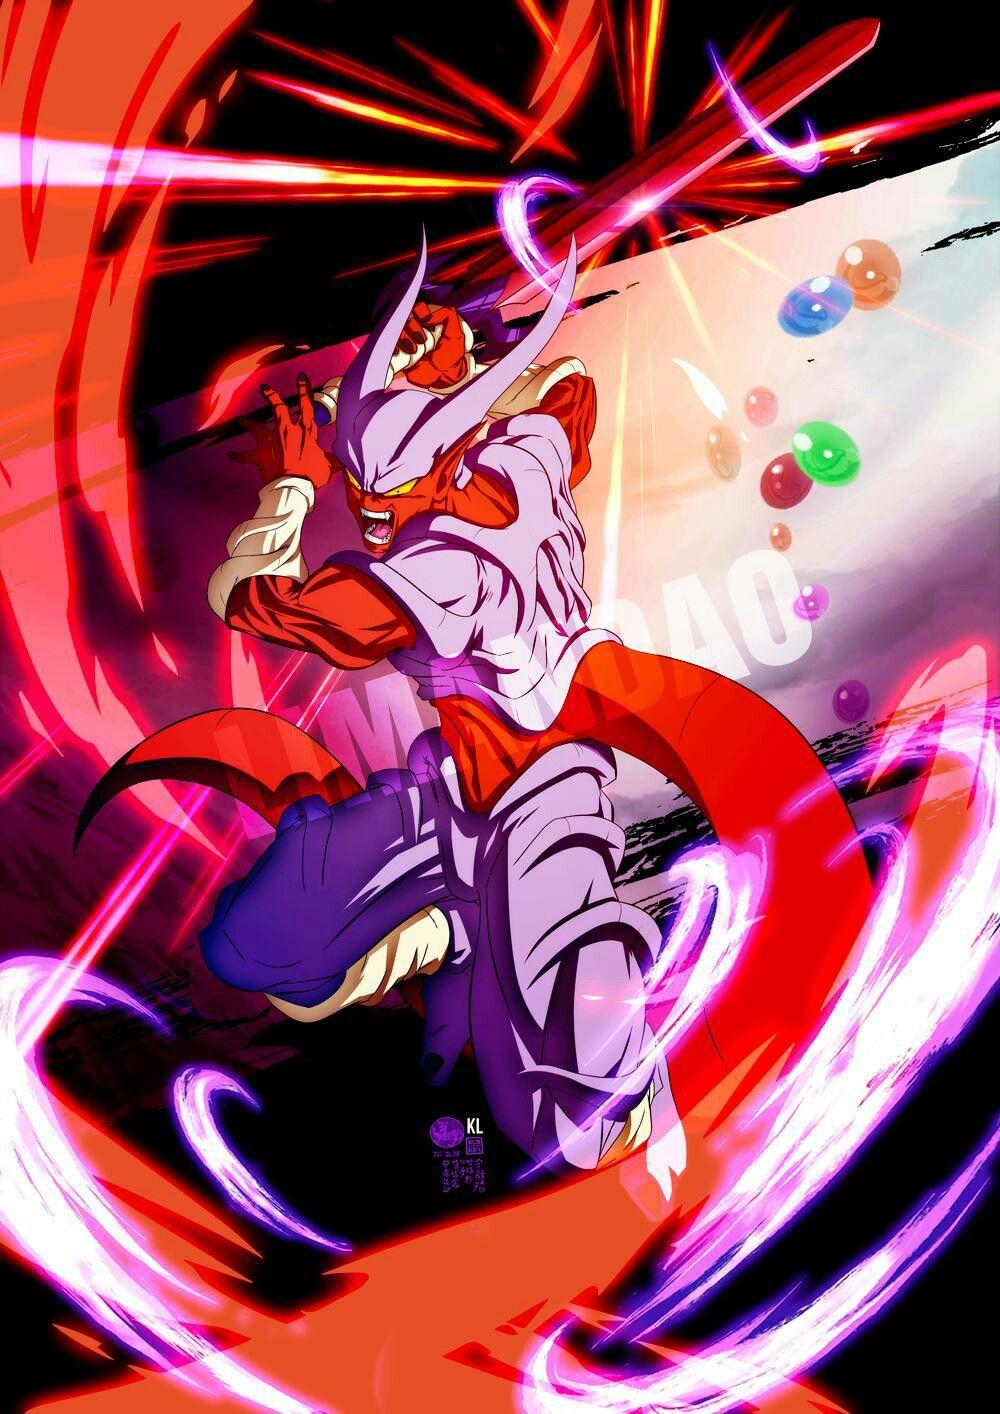 Super Janemba Dragon Ball Artwork Dragon Ball Art Anime Dragon Ball Super